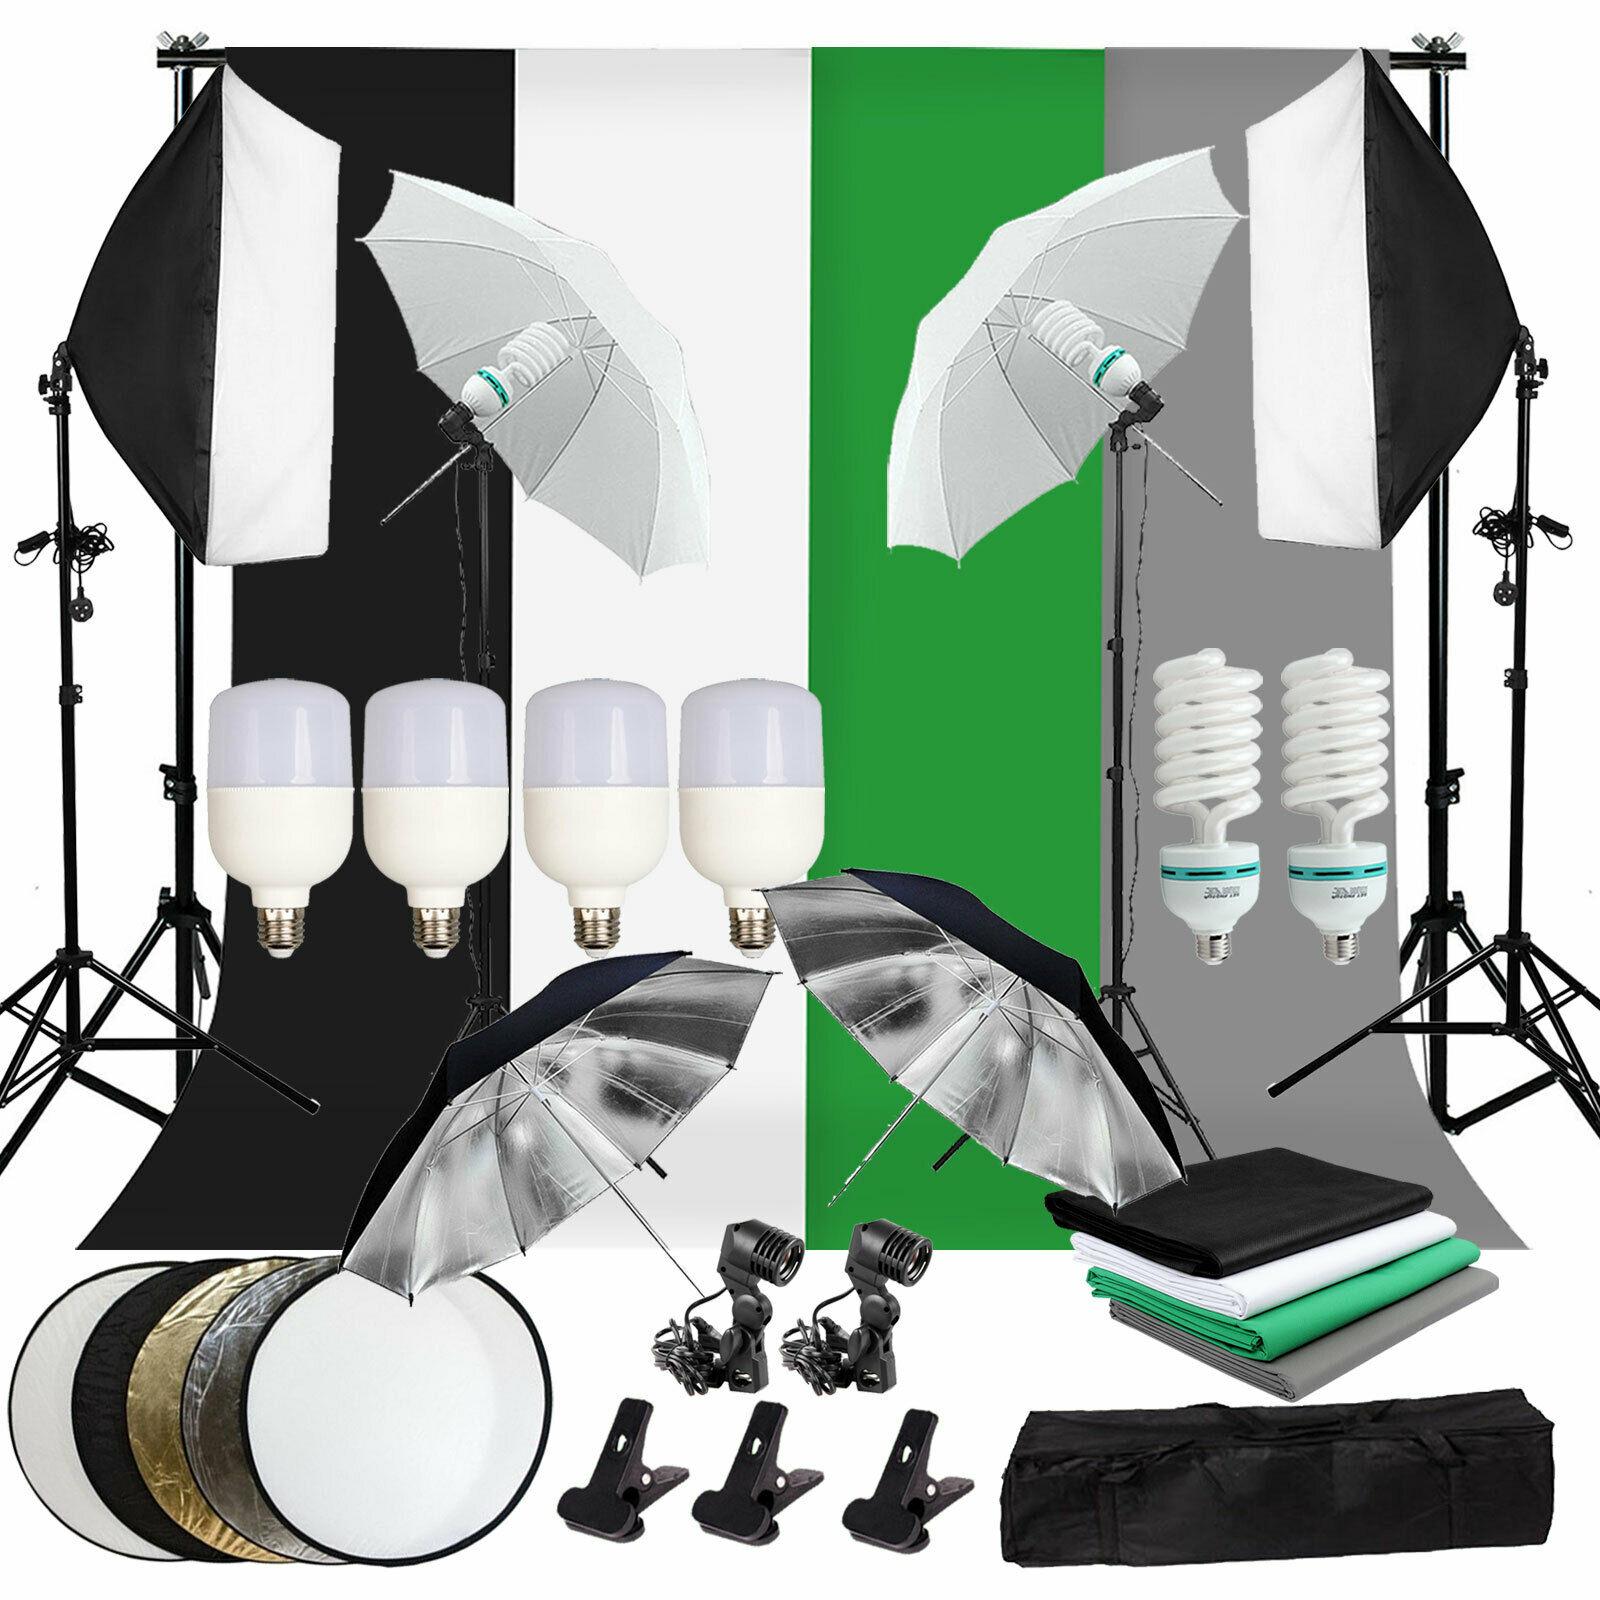 ZUOCHEN صور استوديو LED سوفتبوكس مظلة طقم الإضاءة خلفية حامل داعم خلفية